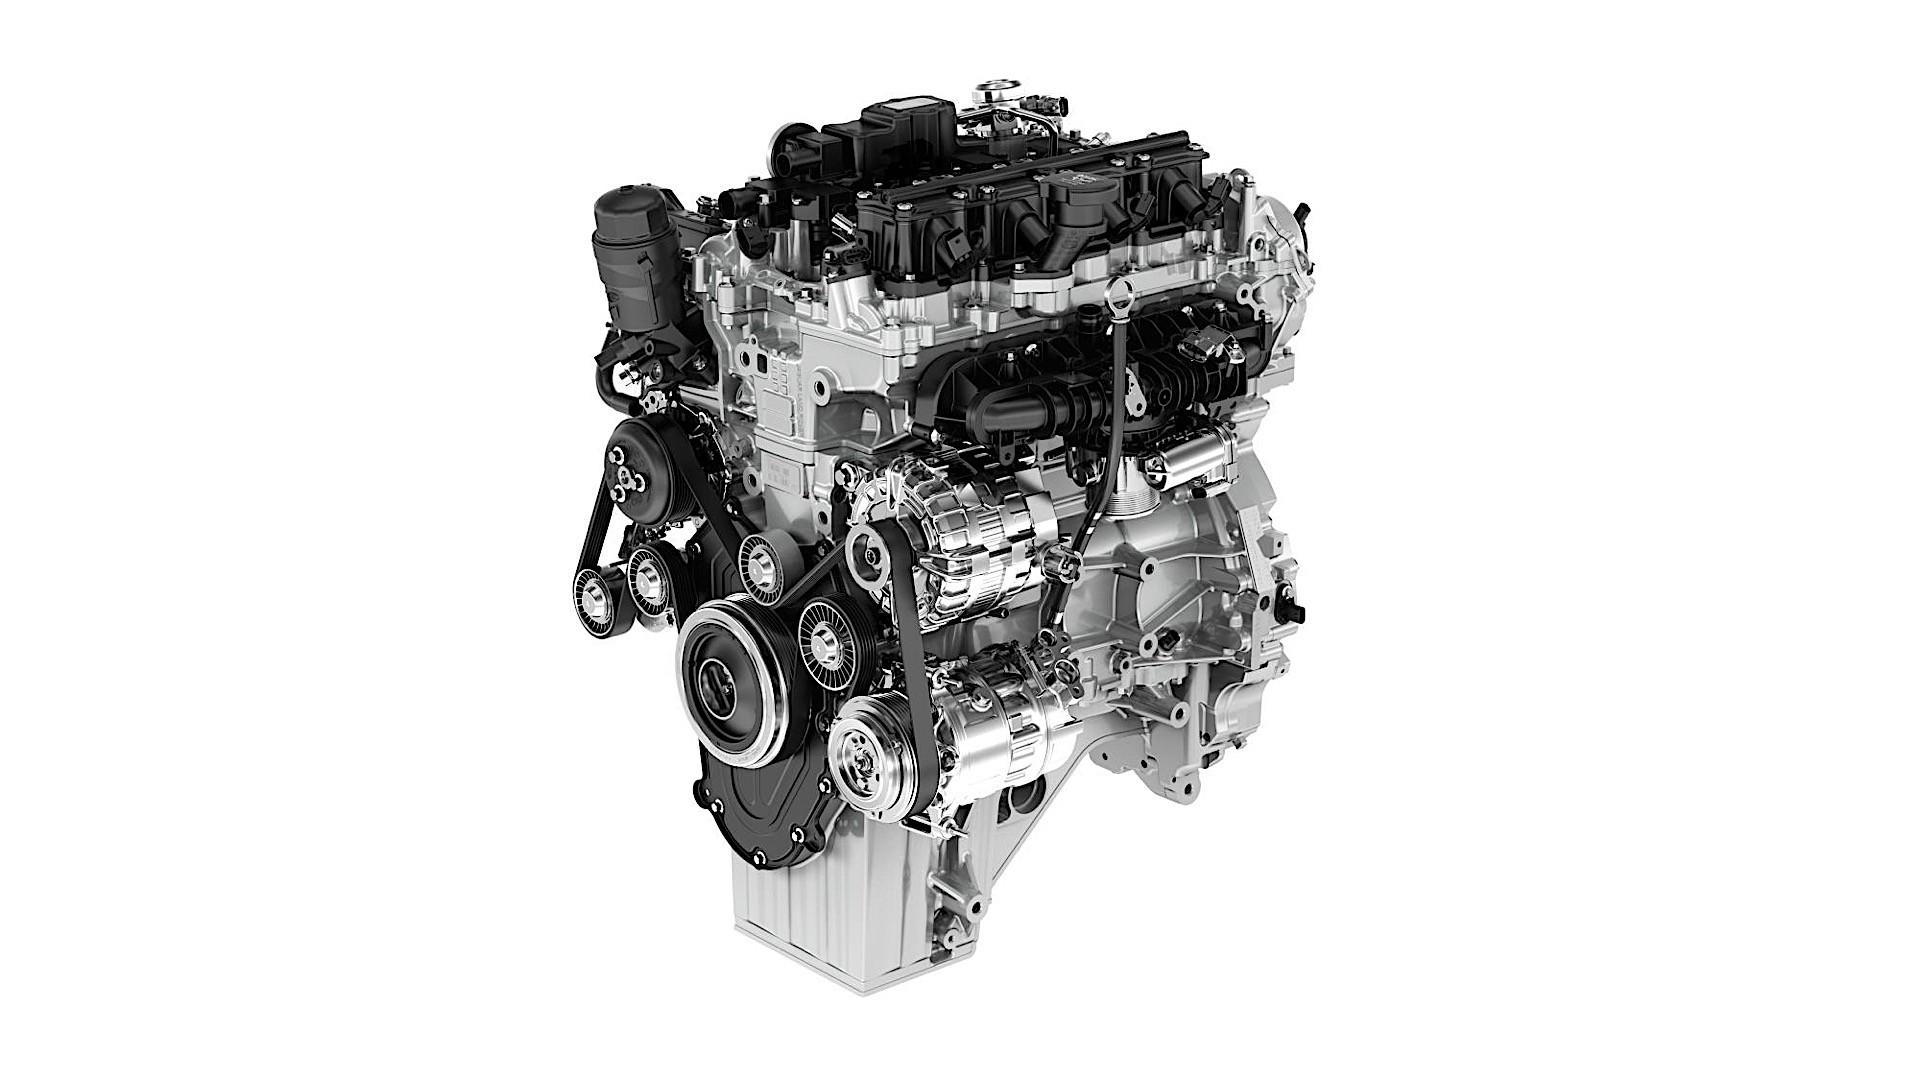 turbo wallpaper jaguar ghij pace f engines